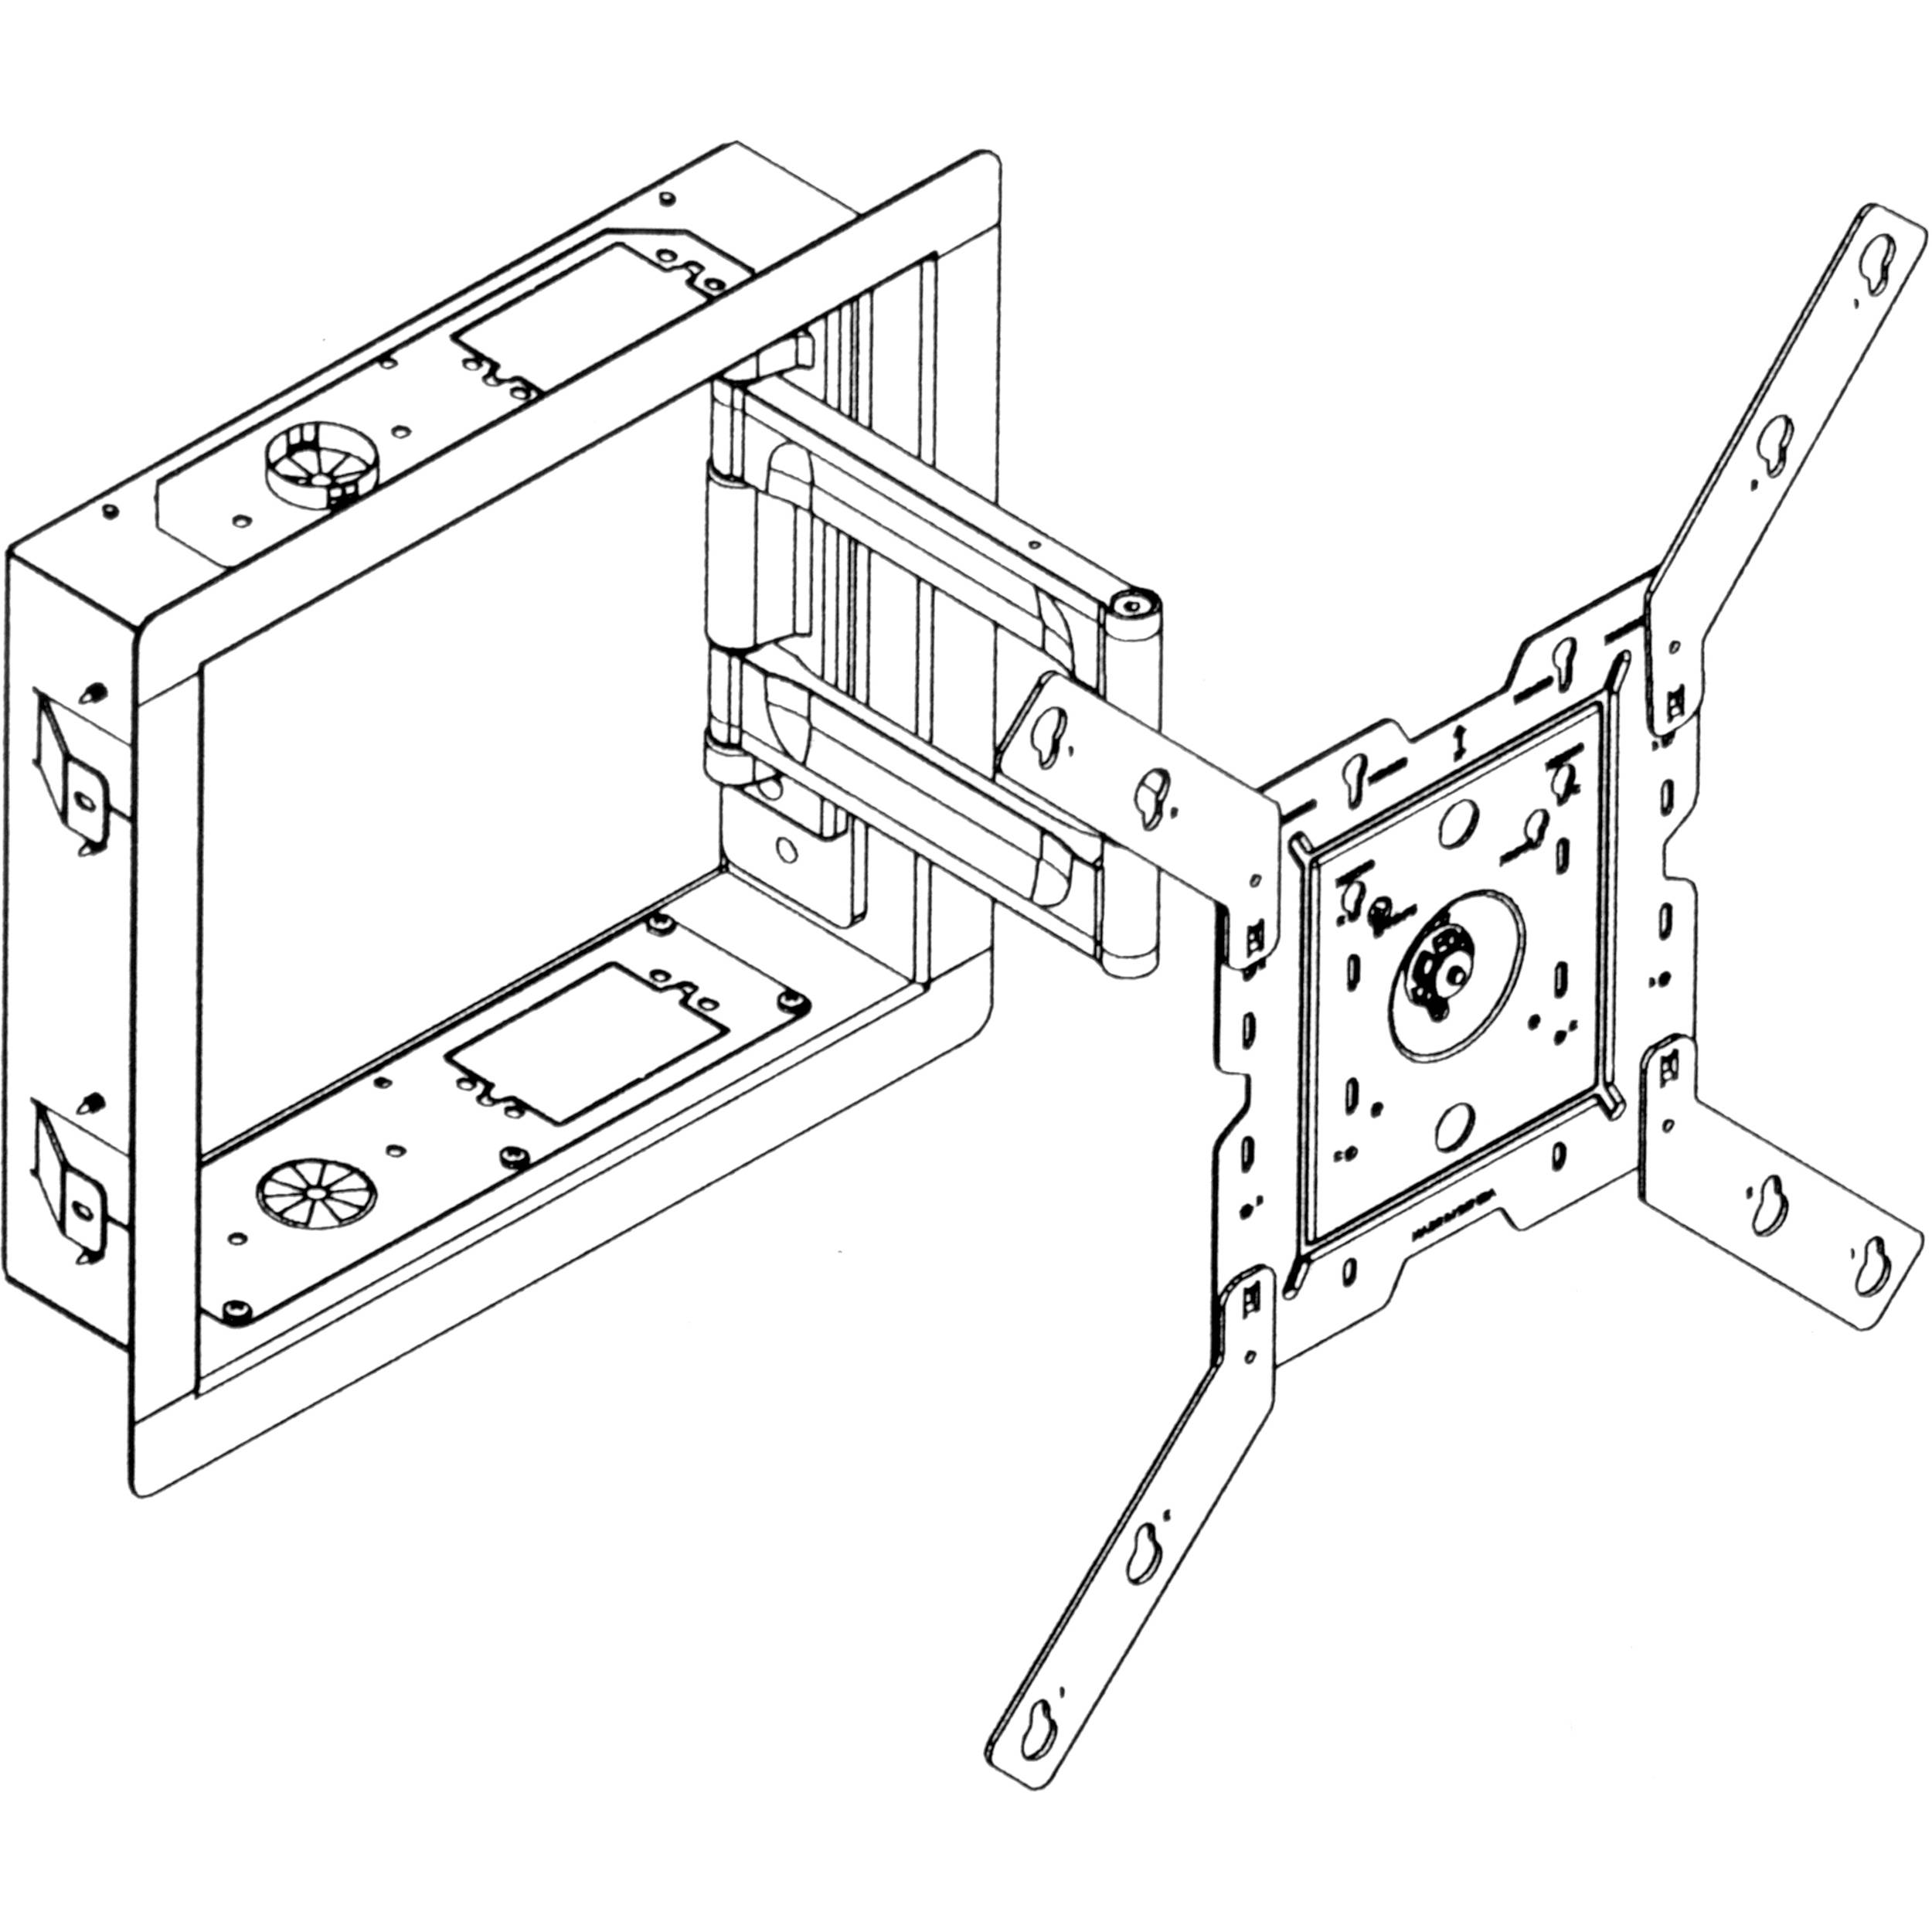 peerless av ib40 w in wall box for lcd screens white ib40 w Stereo Amplifier Wiring Diagram peerless av ib40 w in wall box for lcd screens white